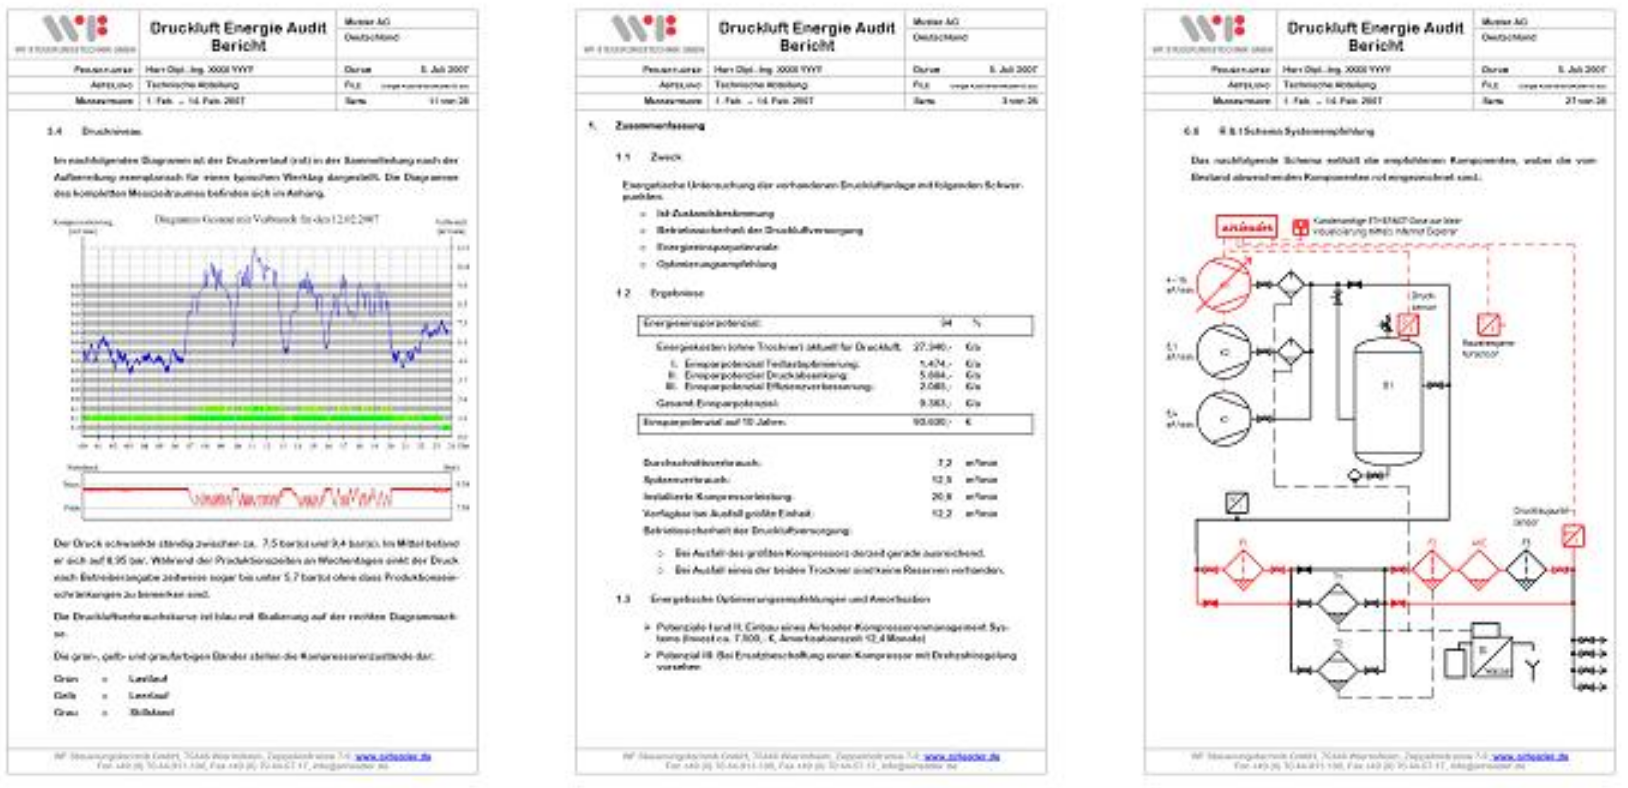 Druckluft Audits 4